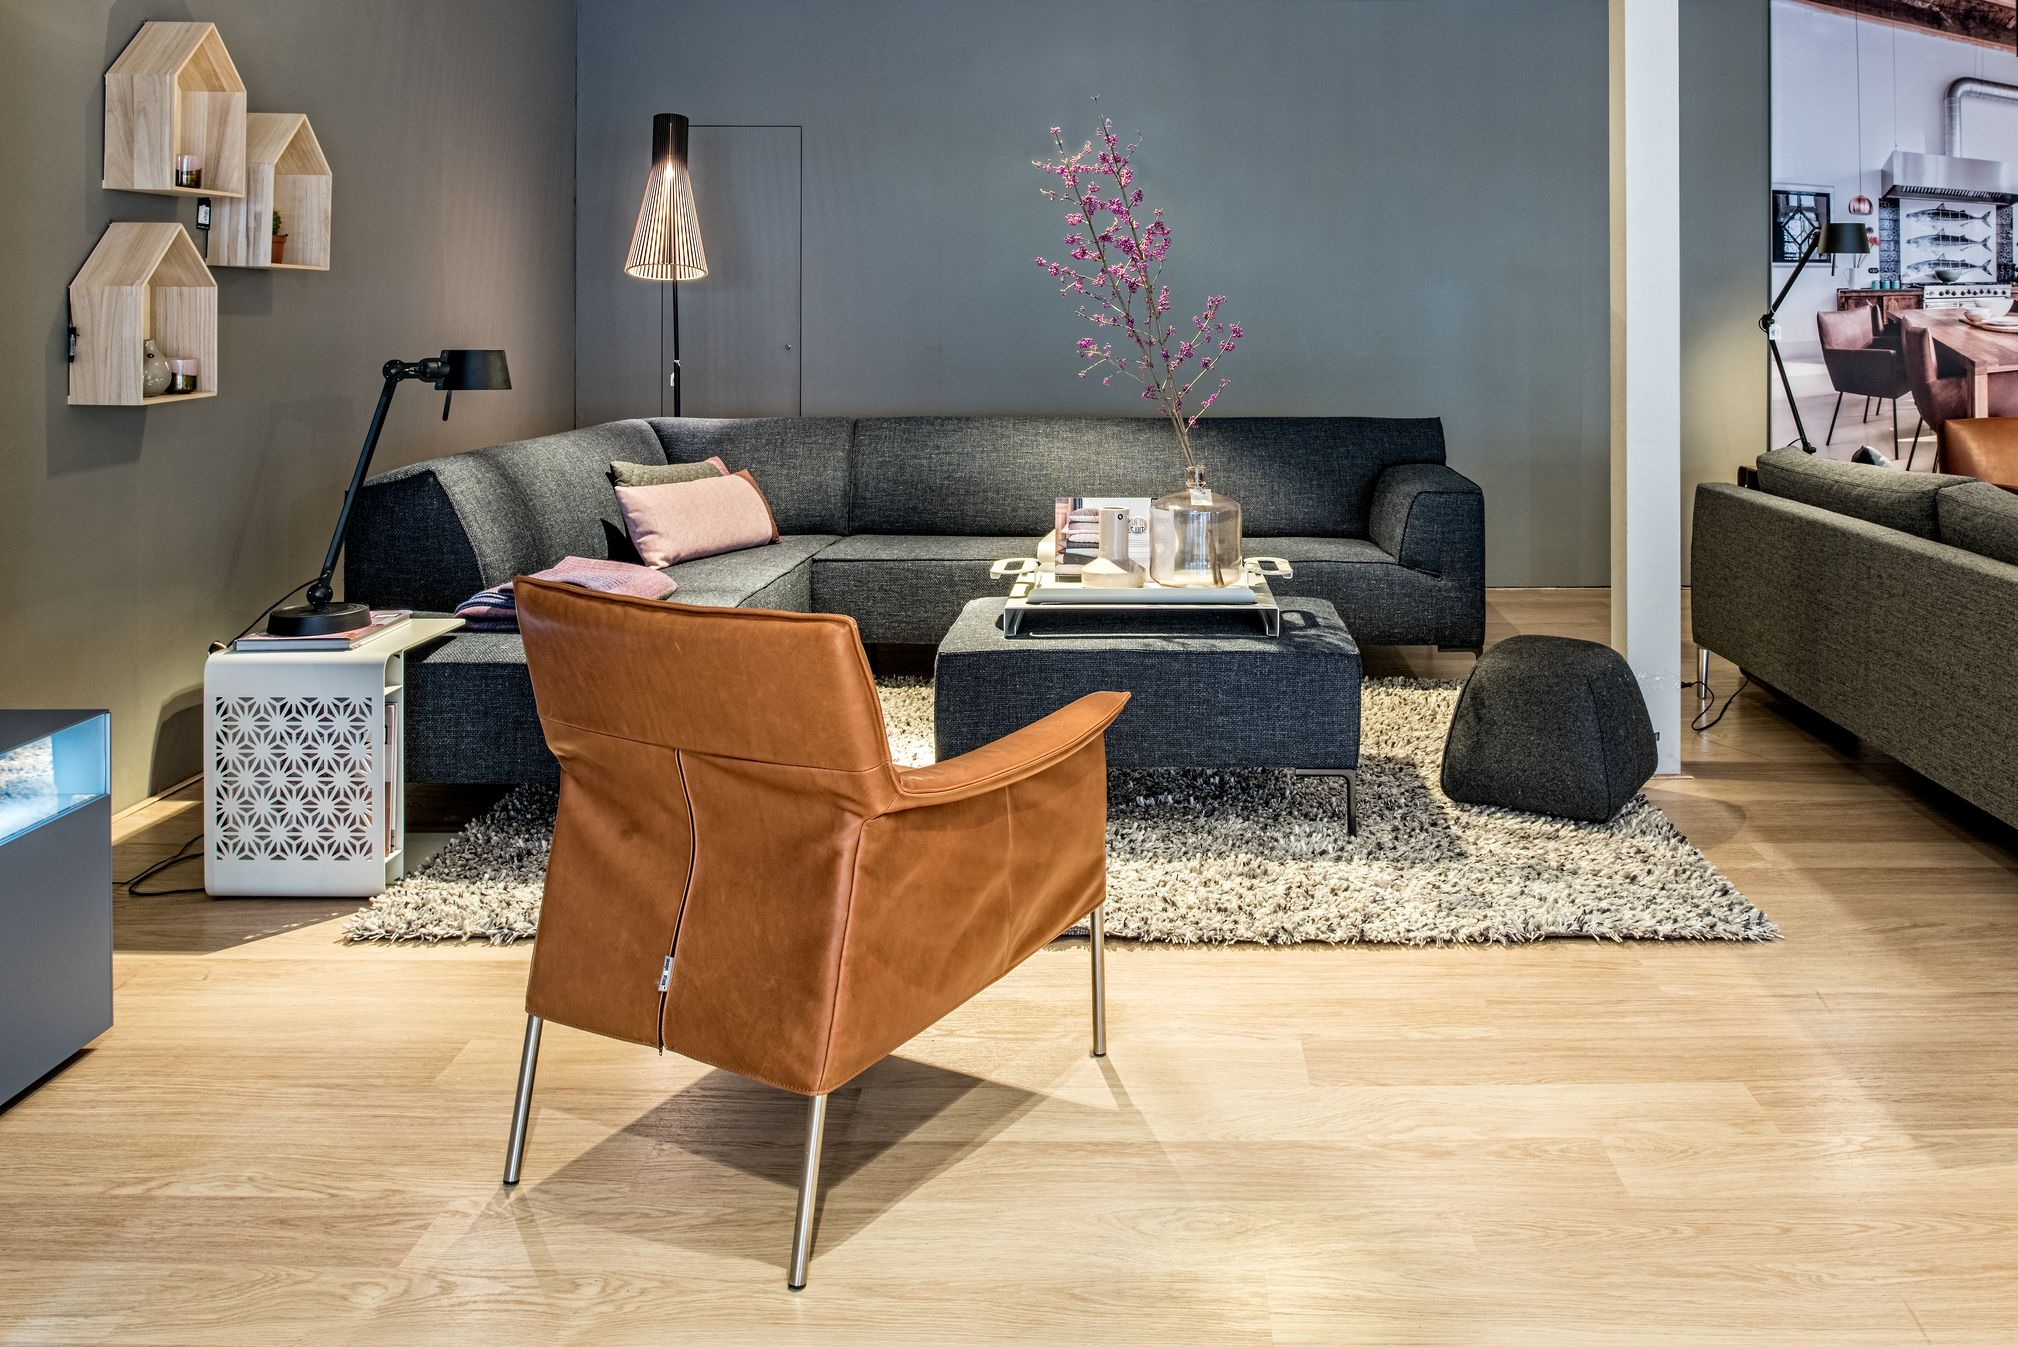 Design On Stock Bloq Fauteuil.Design On Stock Hoekbank Bloq Met Fauteuil Limec Karpet Spring En